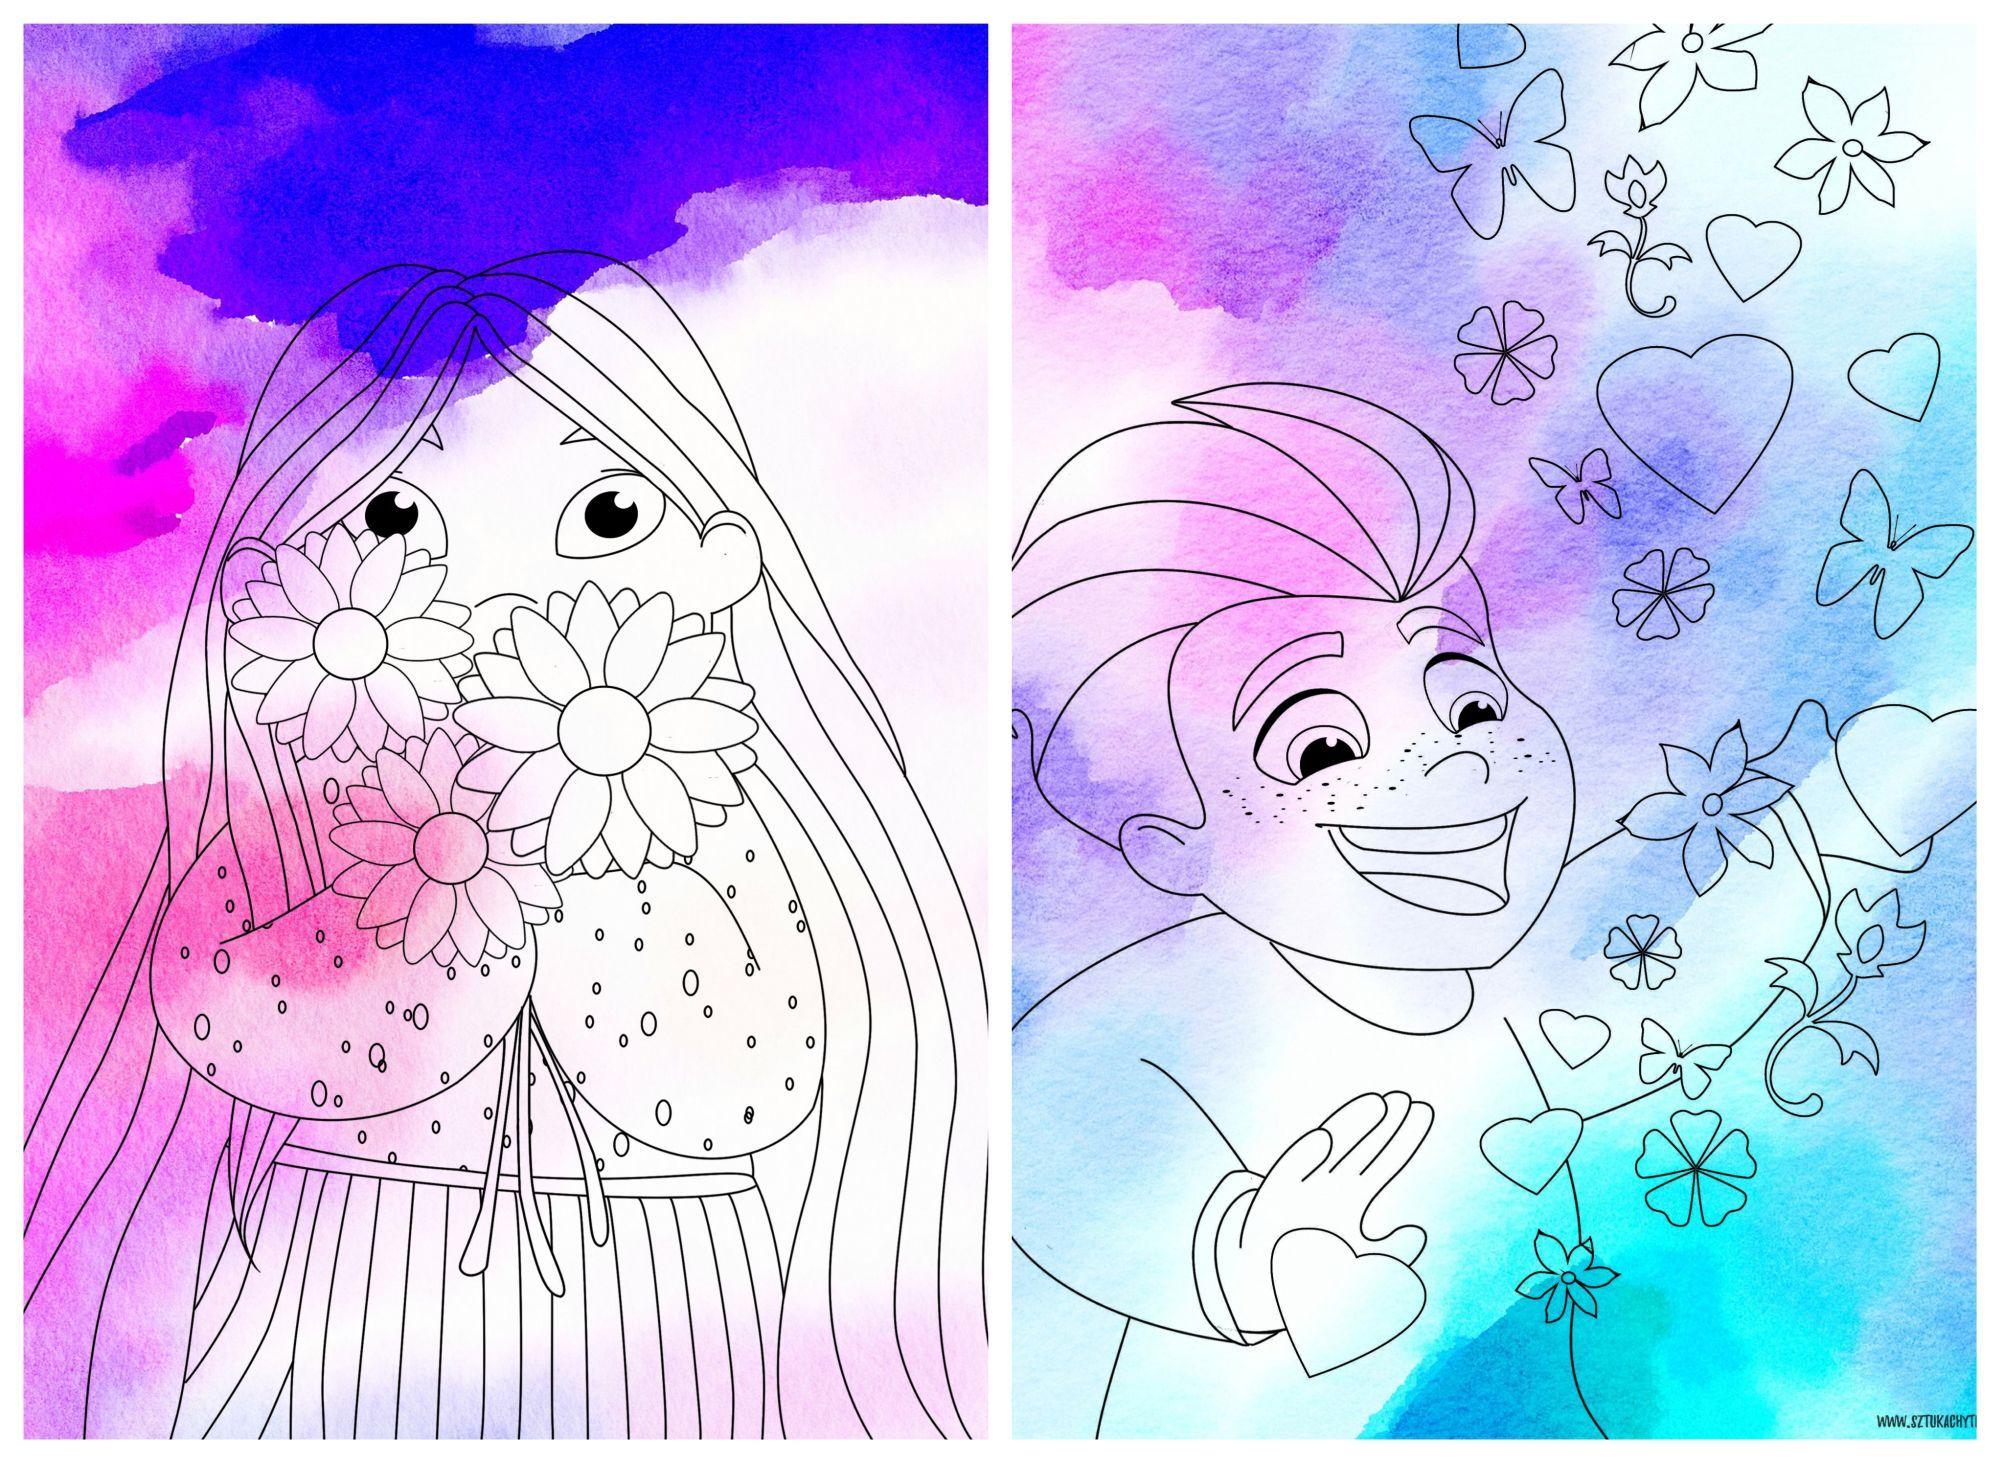 Kolorowanki Dzien Mamy Dzien Taty Chytra Sztuka In 2020 Abstract Artwork Artwork Art